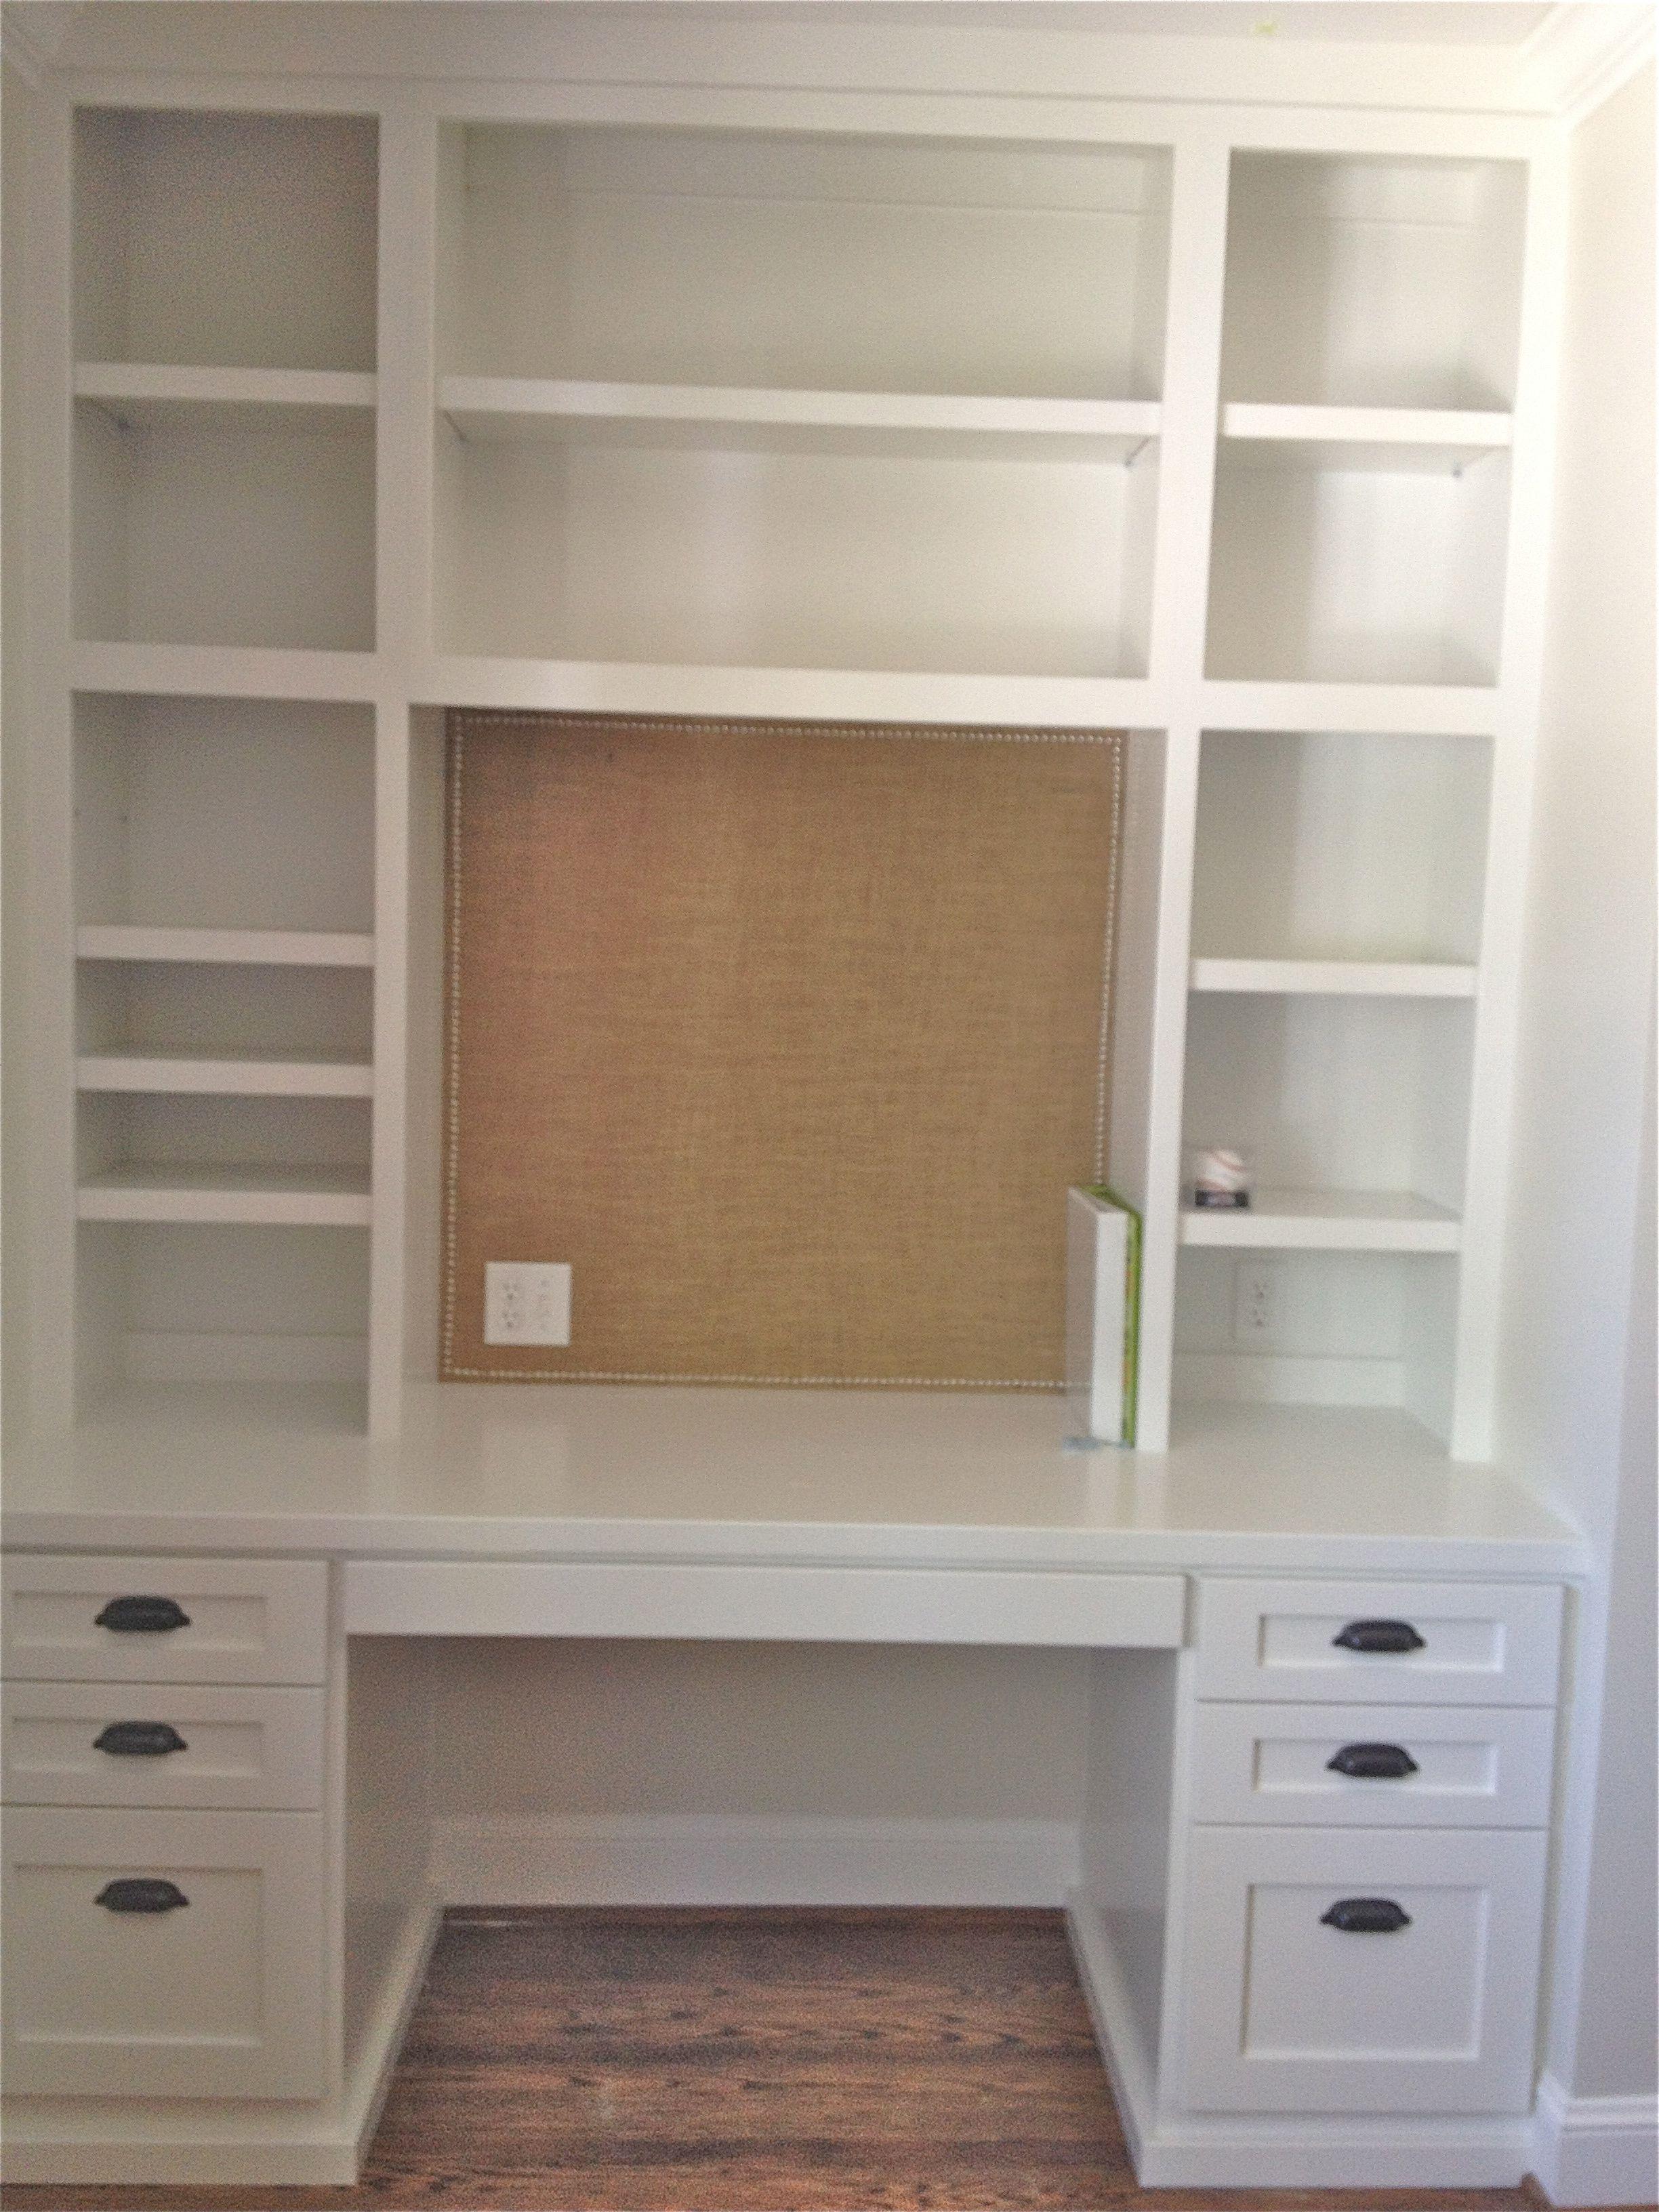 Desks + Bulletin Boards + Burlap Built in desk, Closet